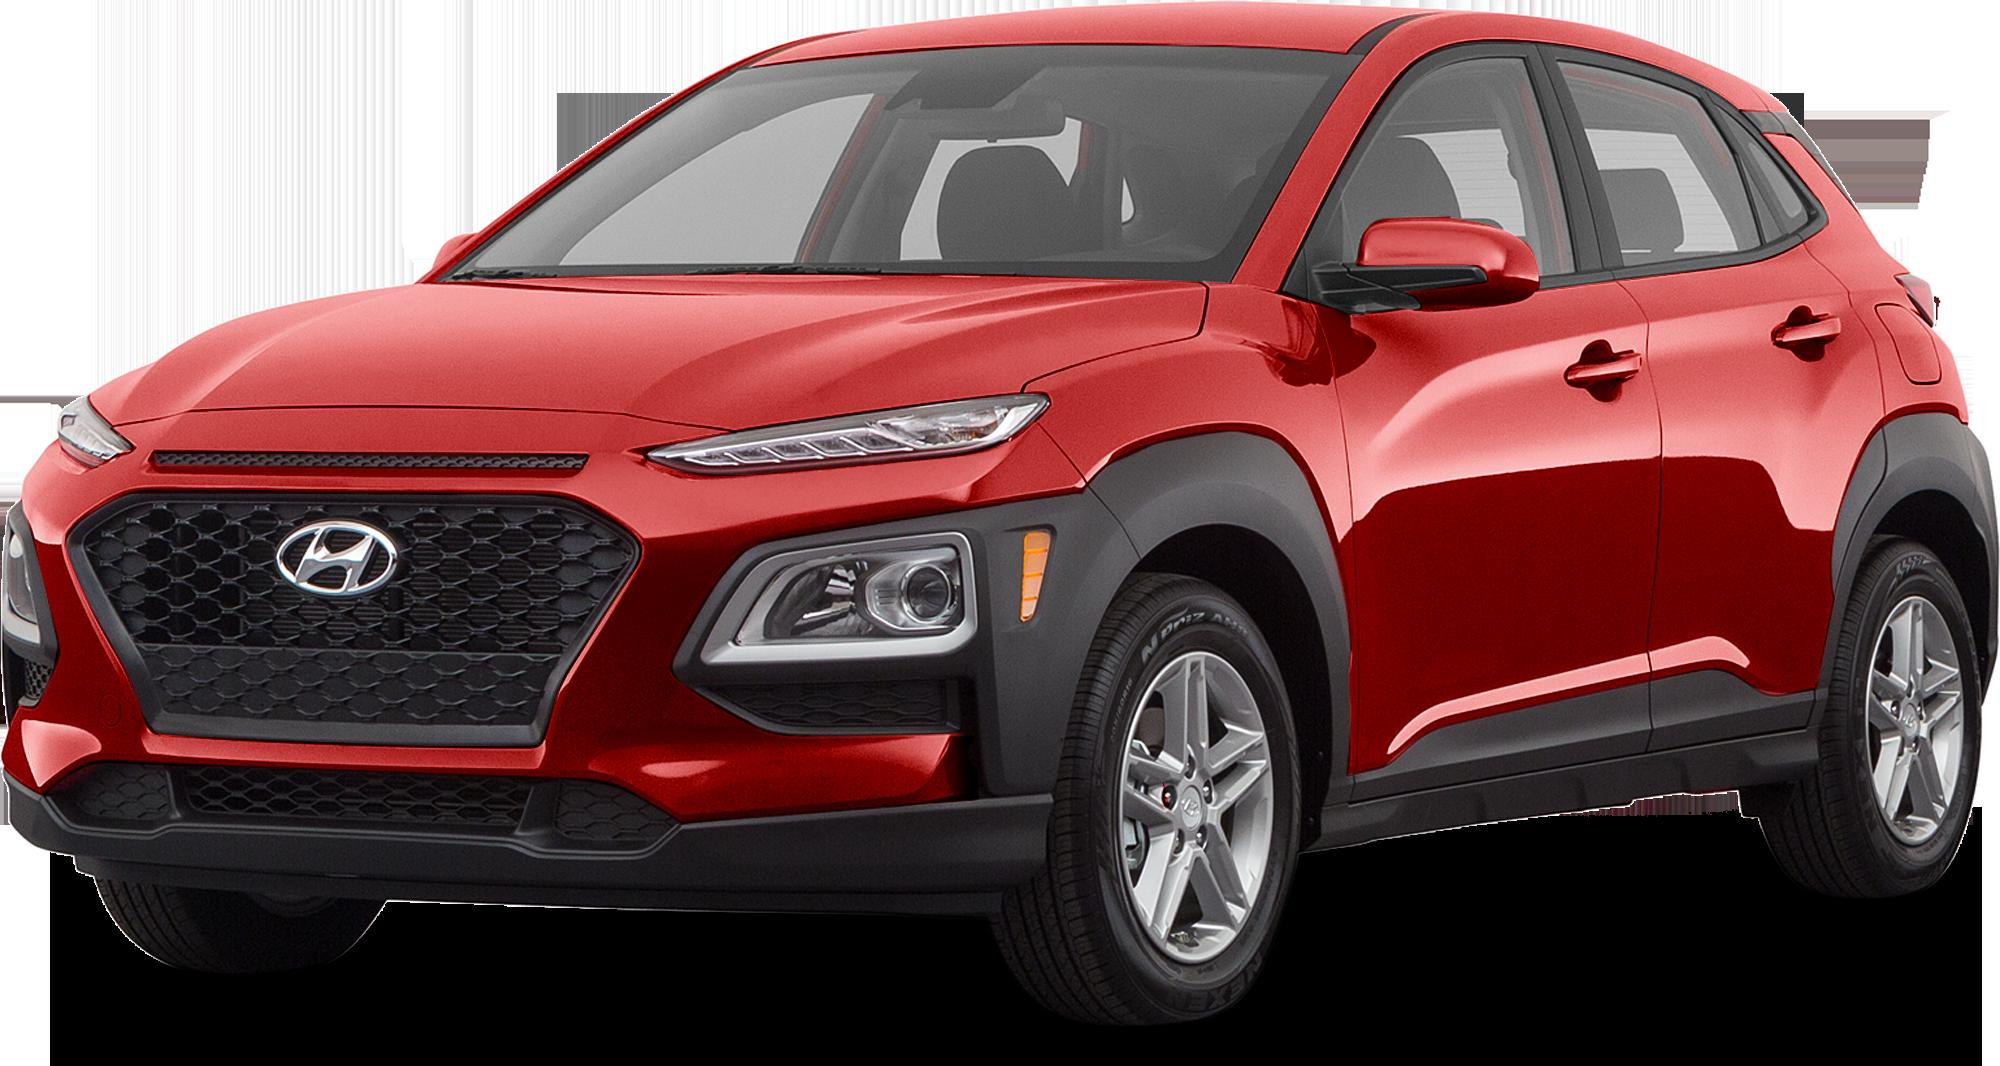 2021 Hyundai Kona Incentives, Specials & Offers in Kirkland WA